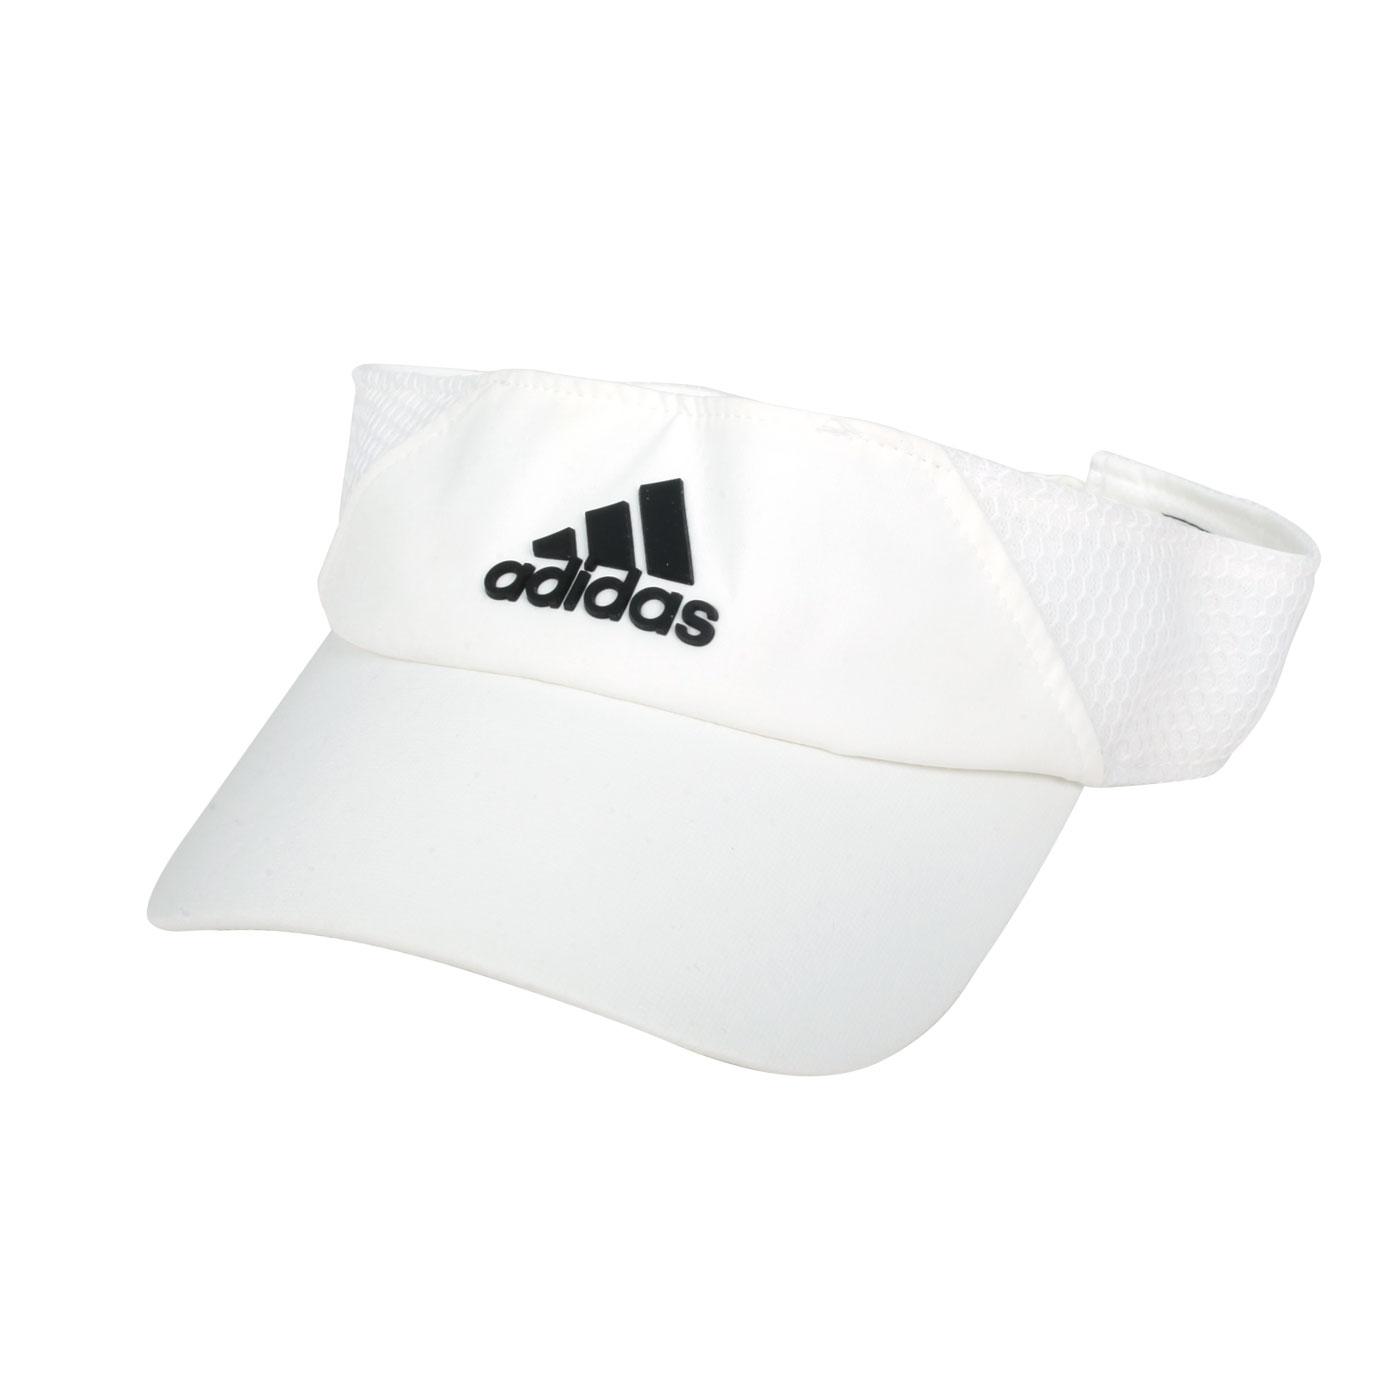 ADIDAS 帽子 GM4520 - 白黑